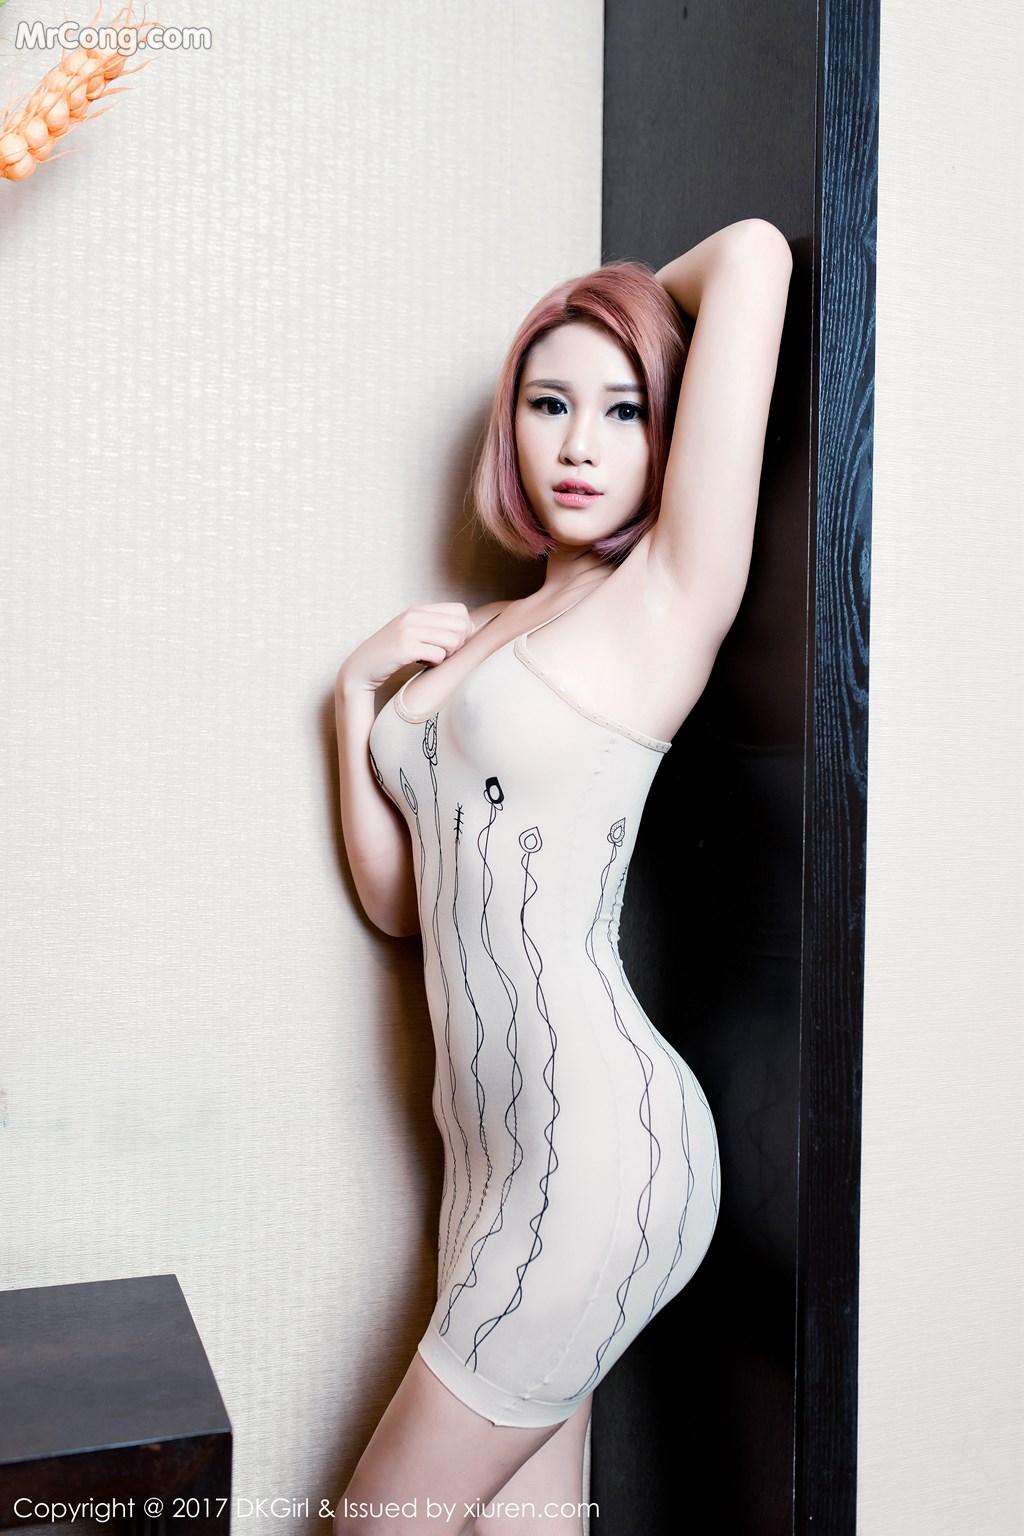 Image DKGirl-Vol.045-Meng-Bao-Er-BoA-MrCong.com-027 in post DKGirl Vol.045: Người mẫu Meng Bao Er (萌宝儿BoA) (56 ảnh)